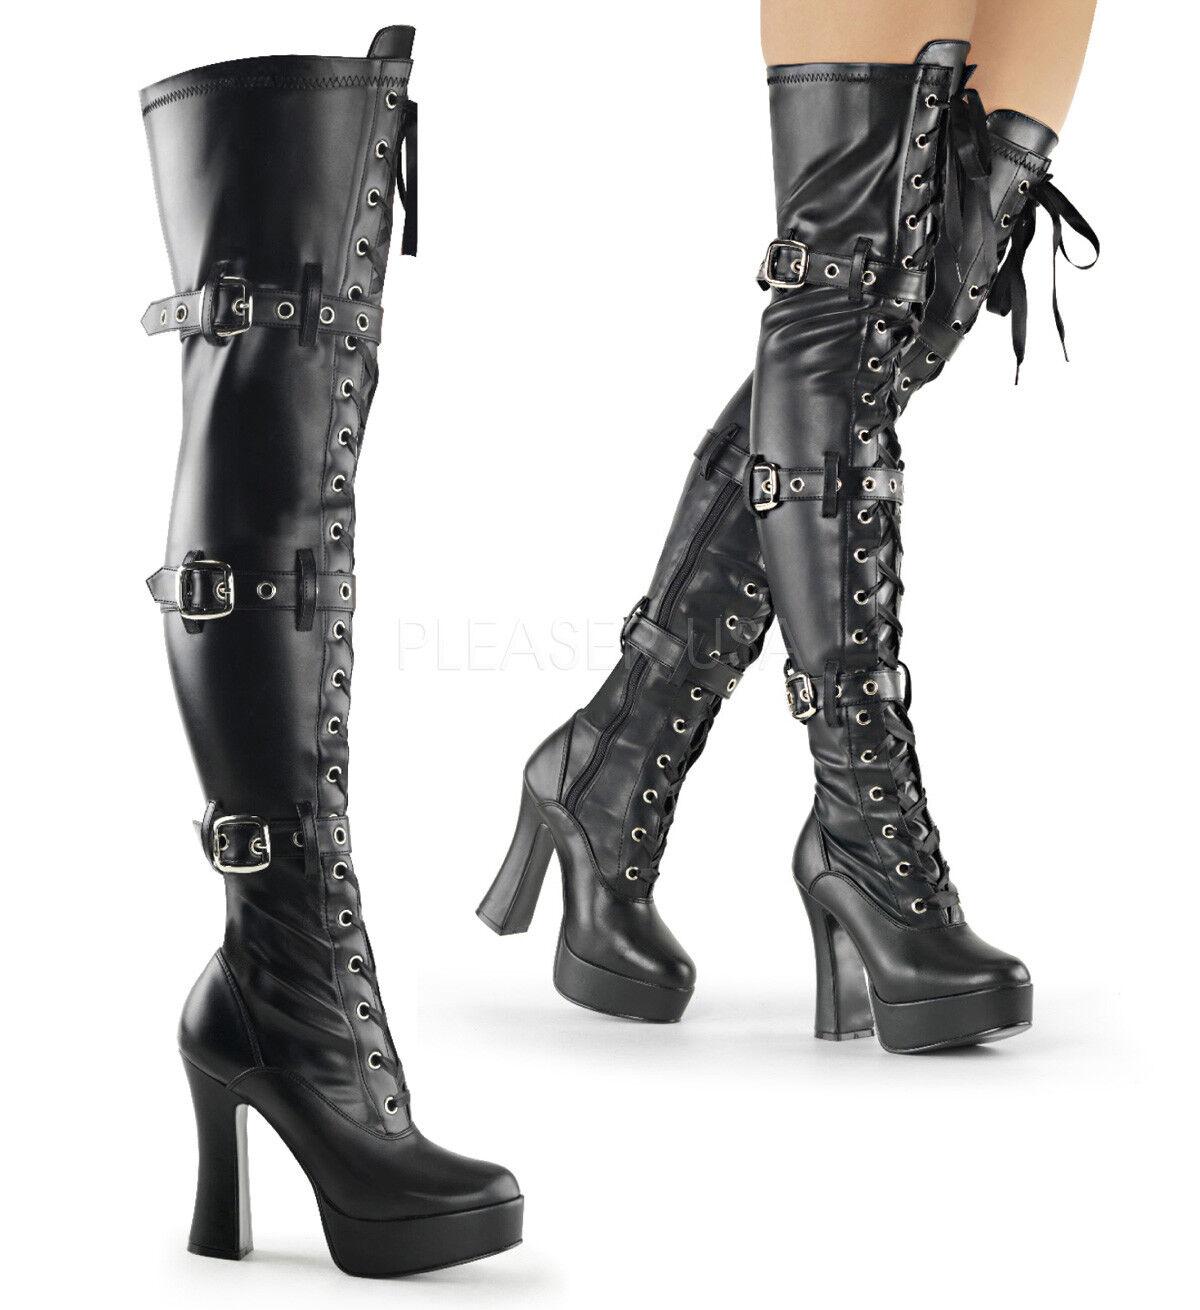 Pleaser ELECTRA-3028 Women's Black Faux Leather Matte Heels Platform Thigh Boots